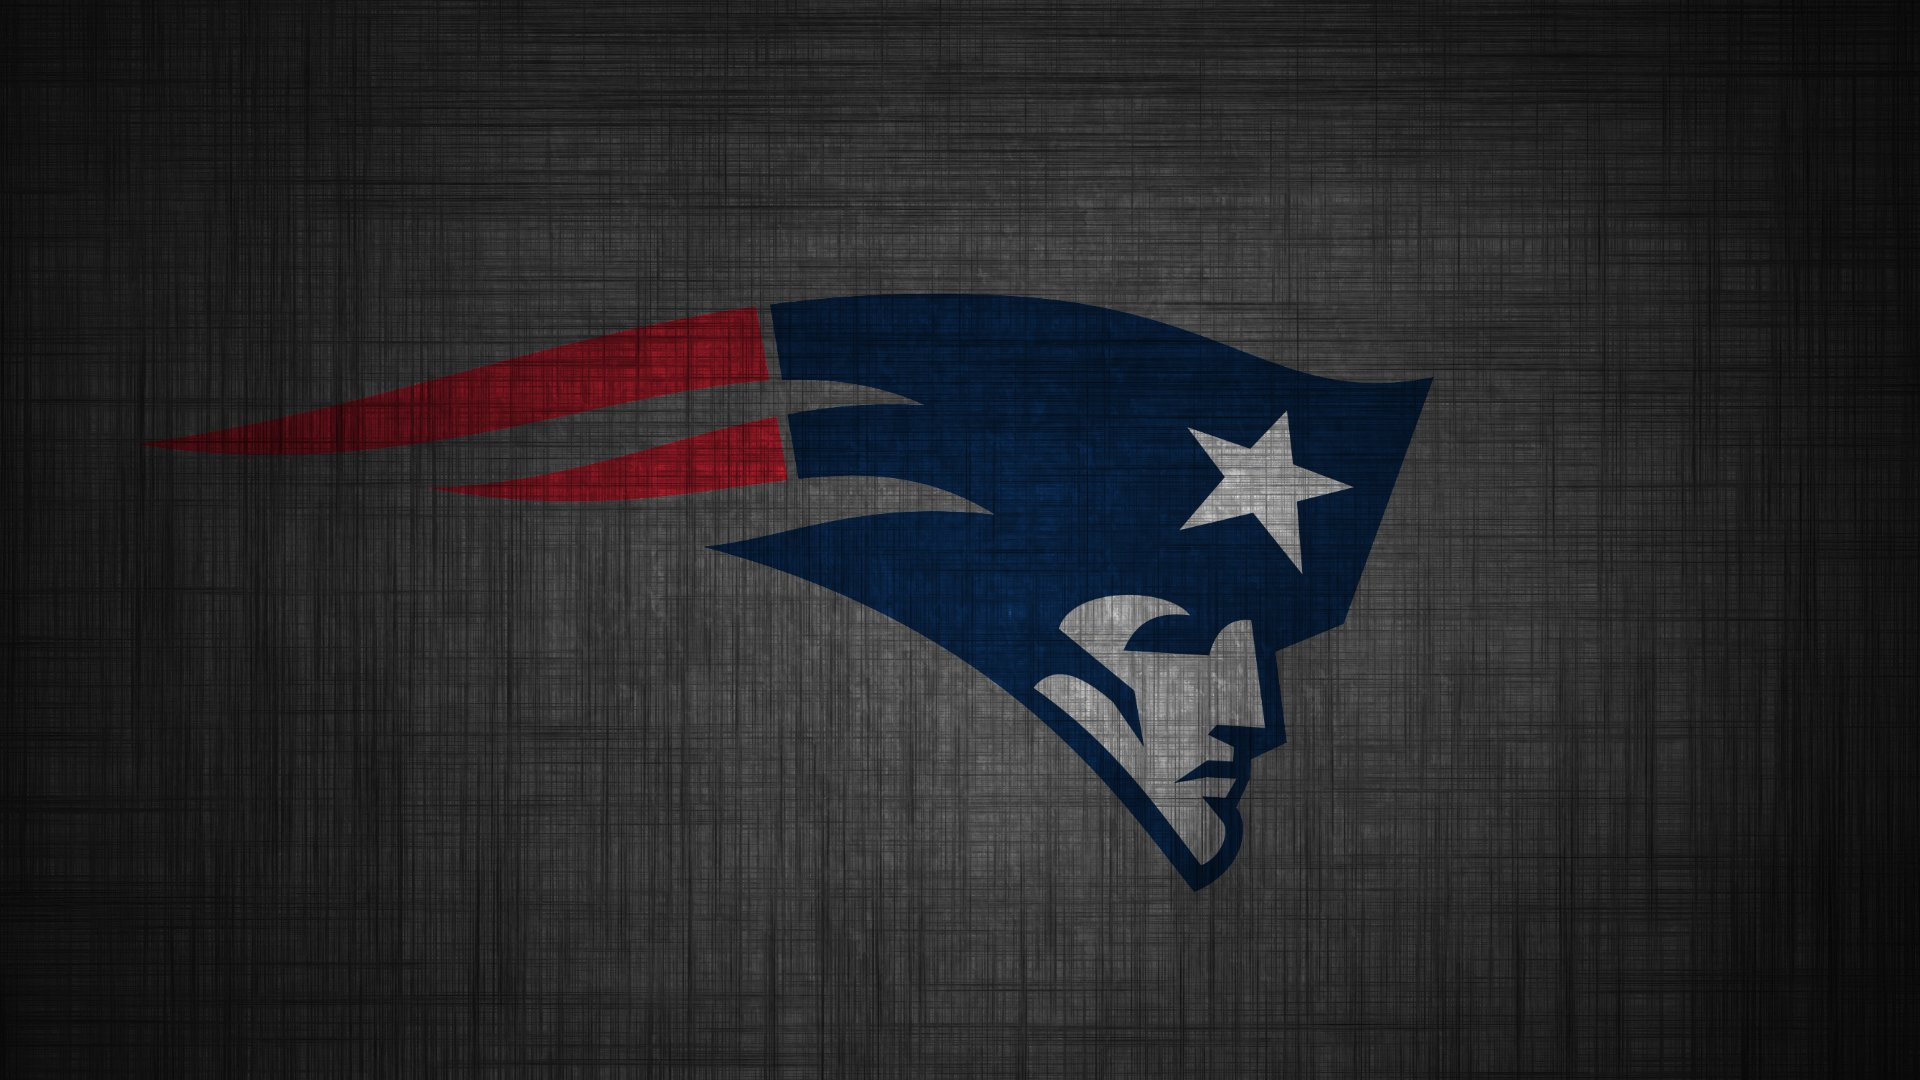 3d Wallpaper Of Cars And Bikes New England Patriots Logo Wallpaper 55965 1920x1080 Px